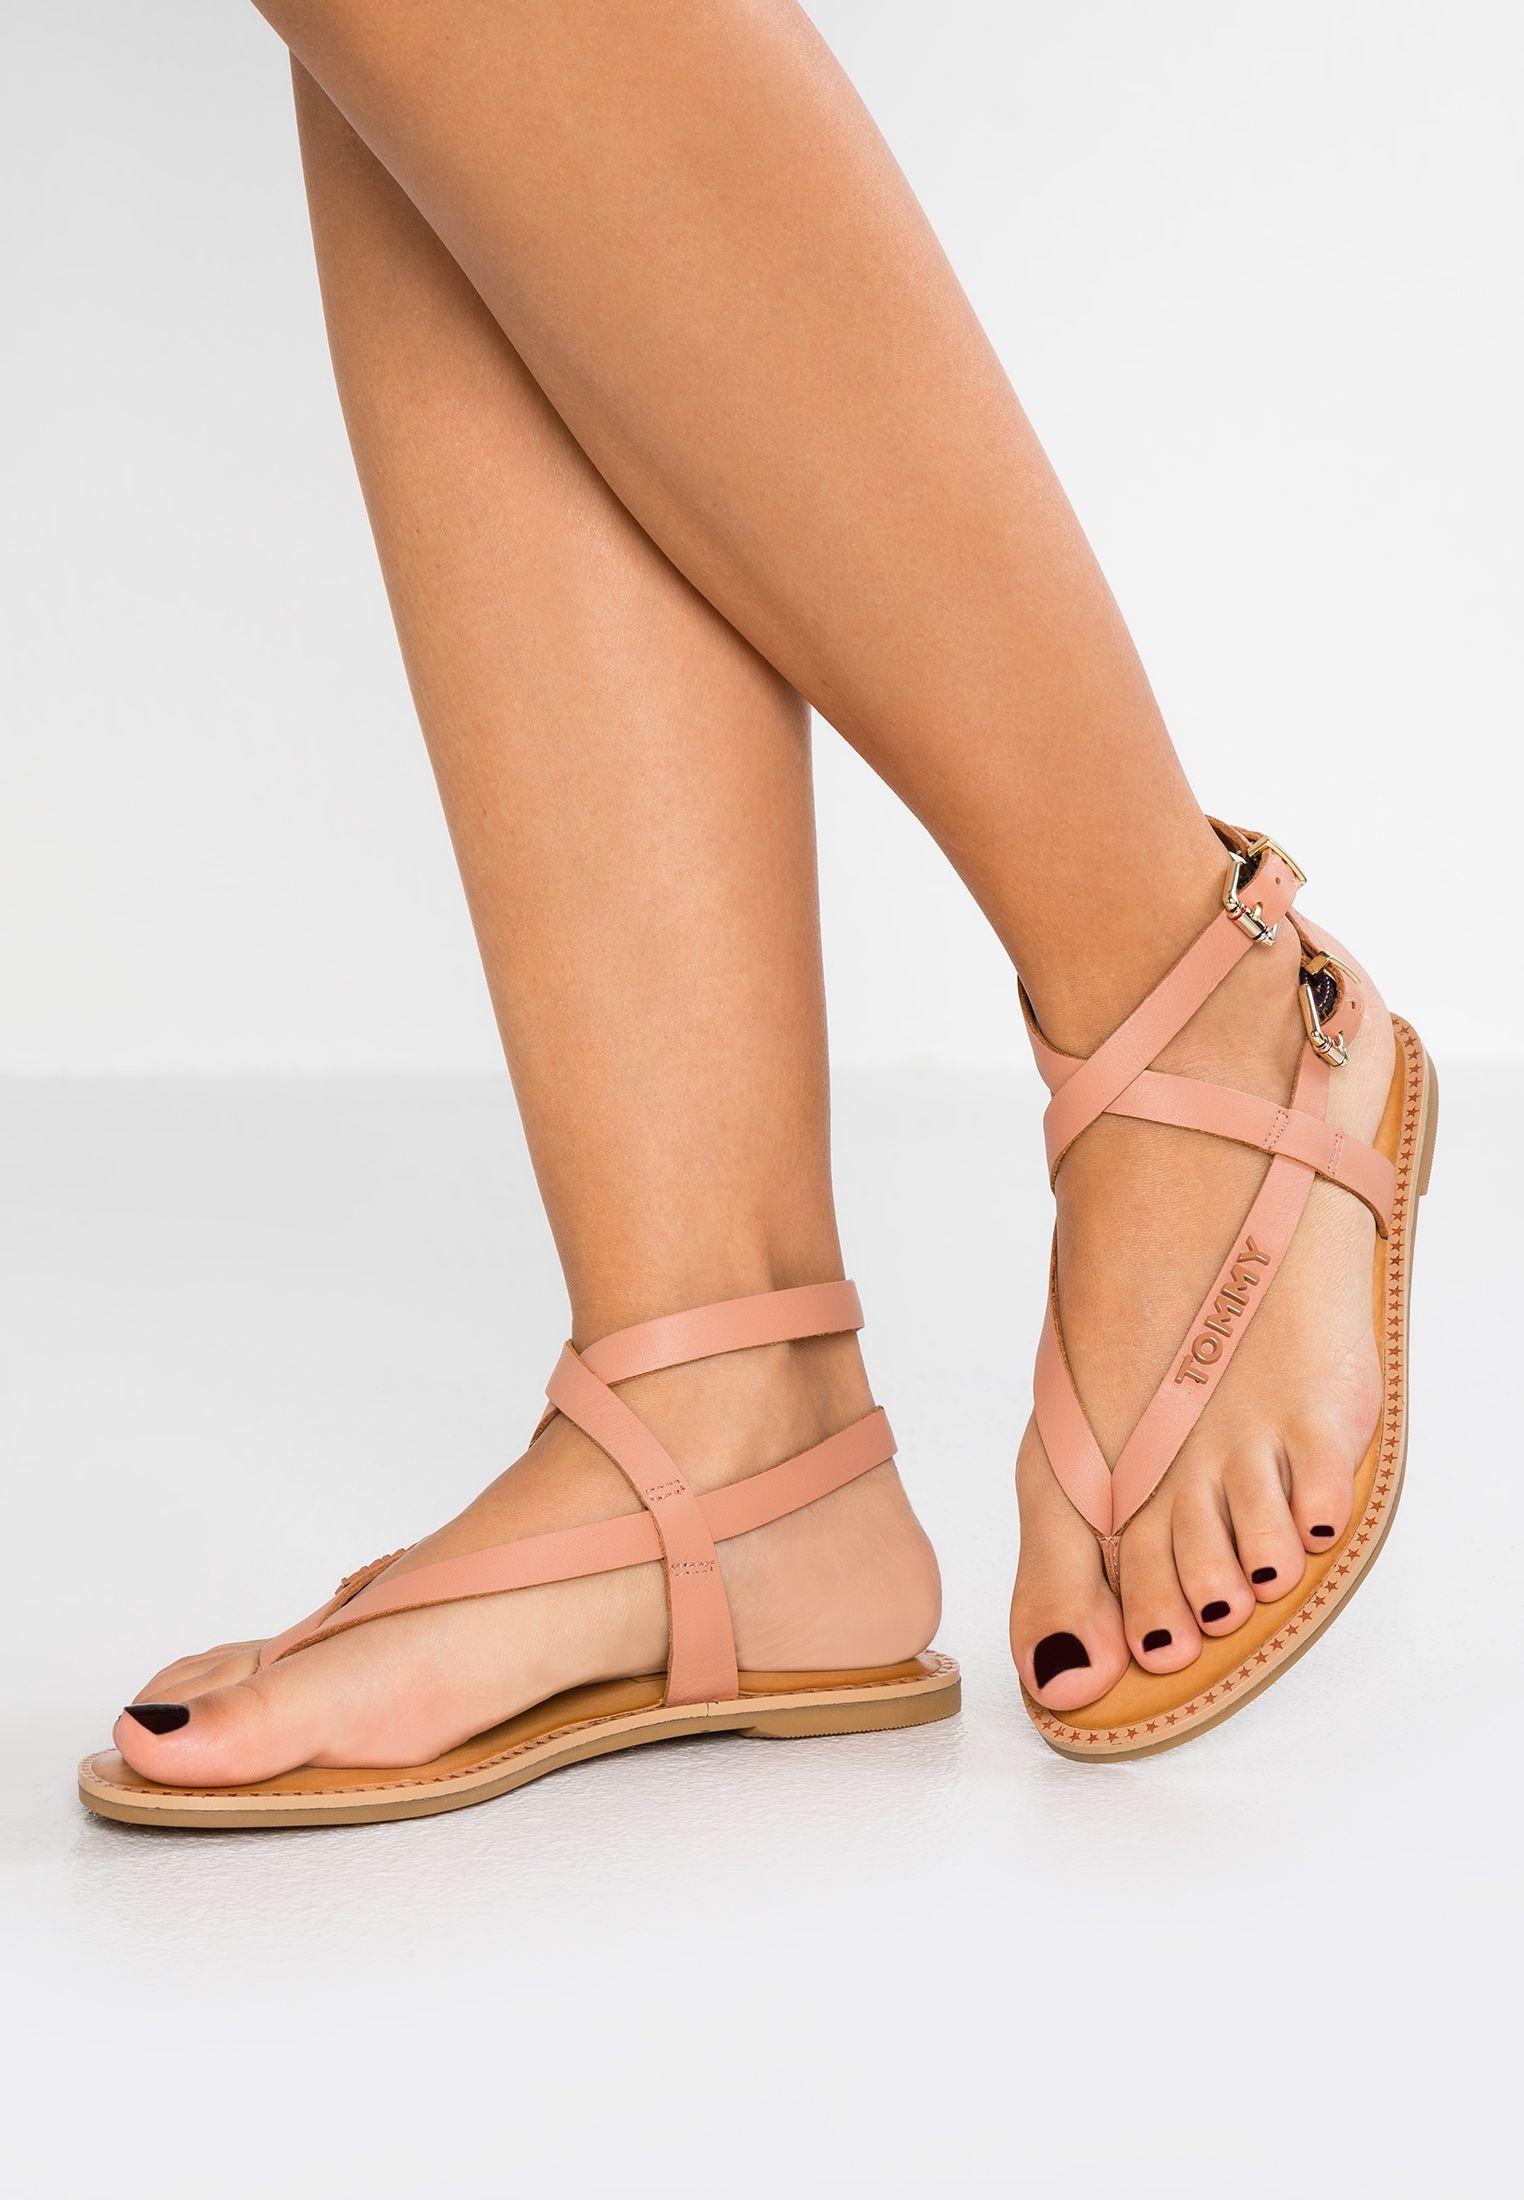 ICONIC FLAT STRAPPY T bar sandals beige @ Zalando.co.uk